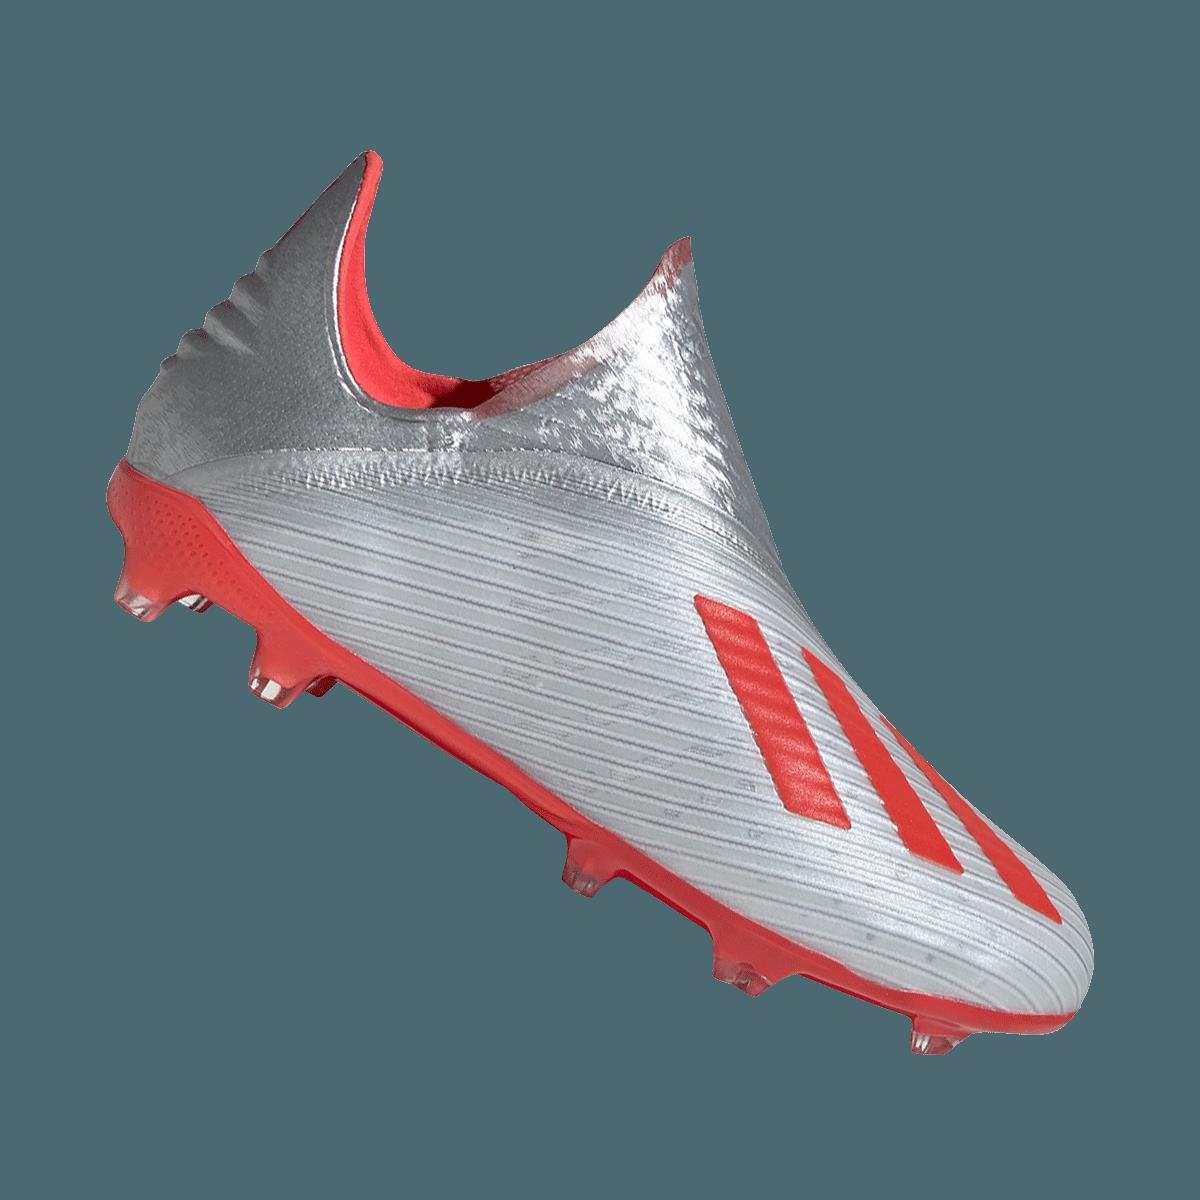 adidas Kinder Fußballschuh X 19+ FG J silberrot